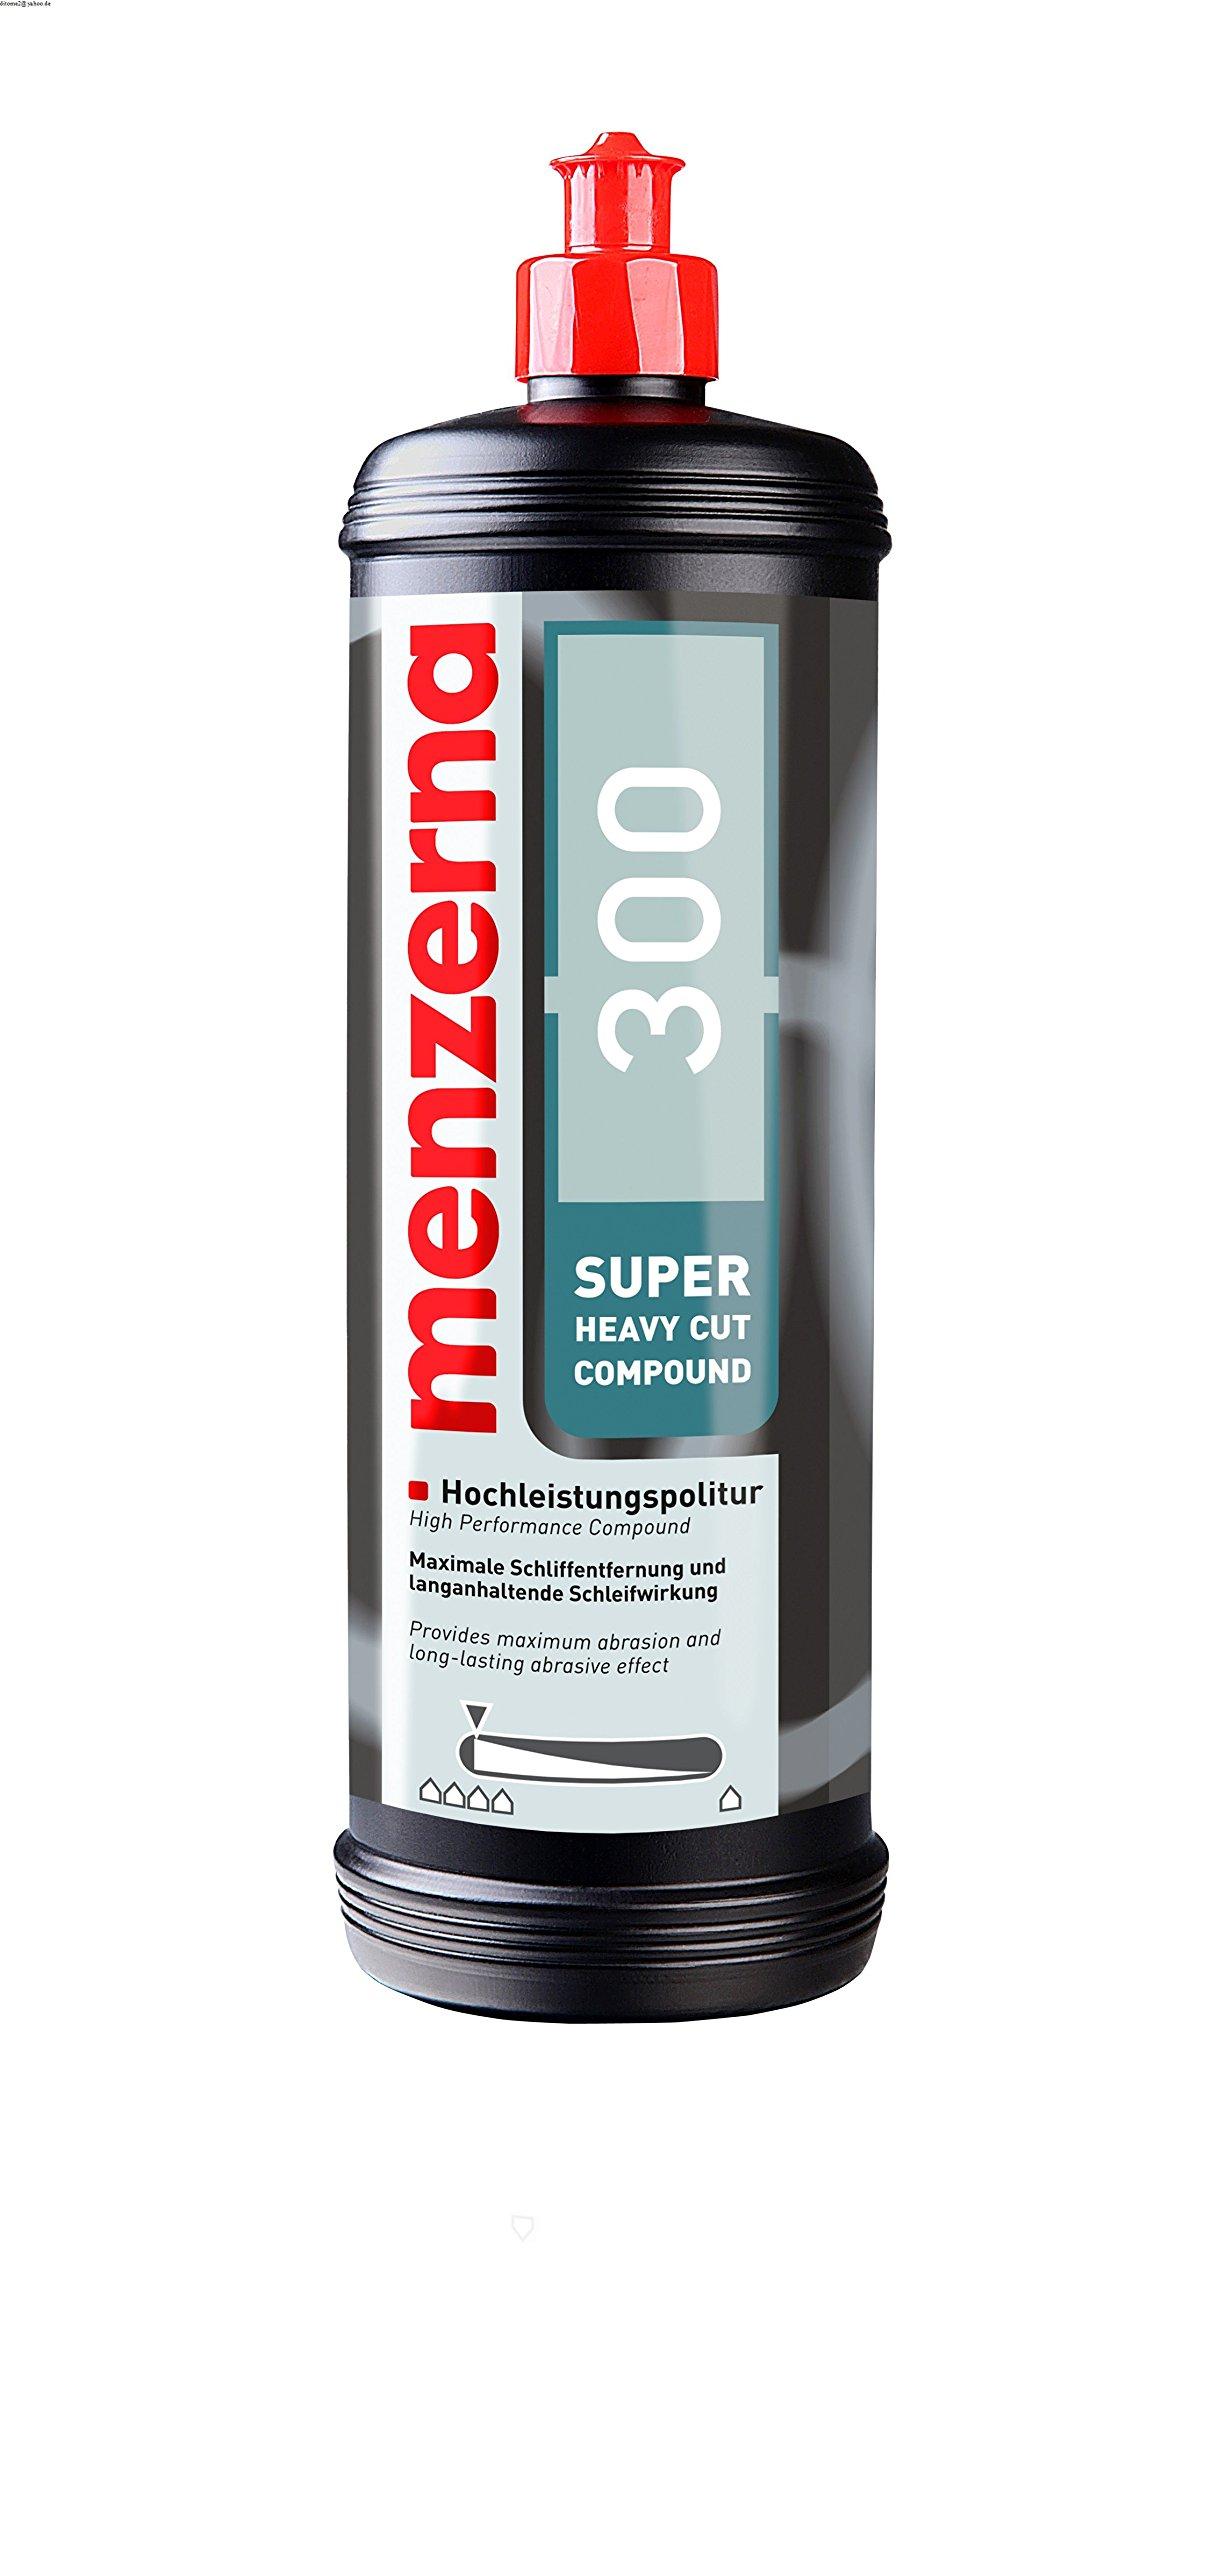 Menzerna SHC300Q - Super Heavy Cut Compound 300 Quart Bottle